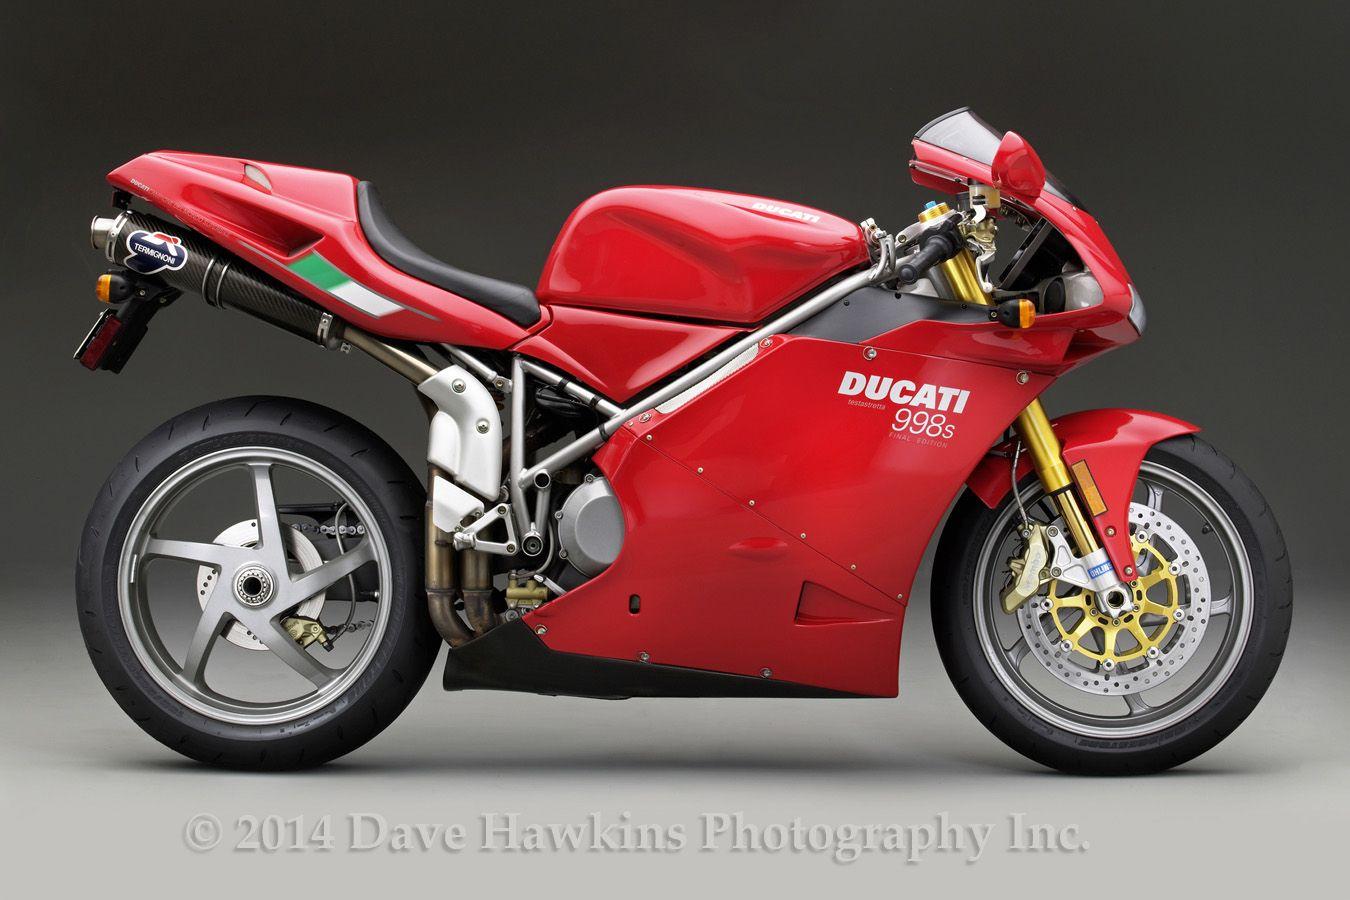 Ducati 998s, Superbike - ©2014 Dave Hawkins Photography, Nashville